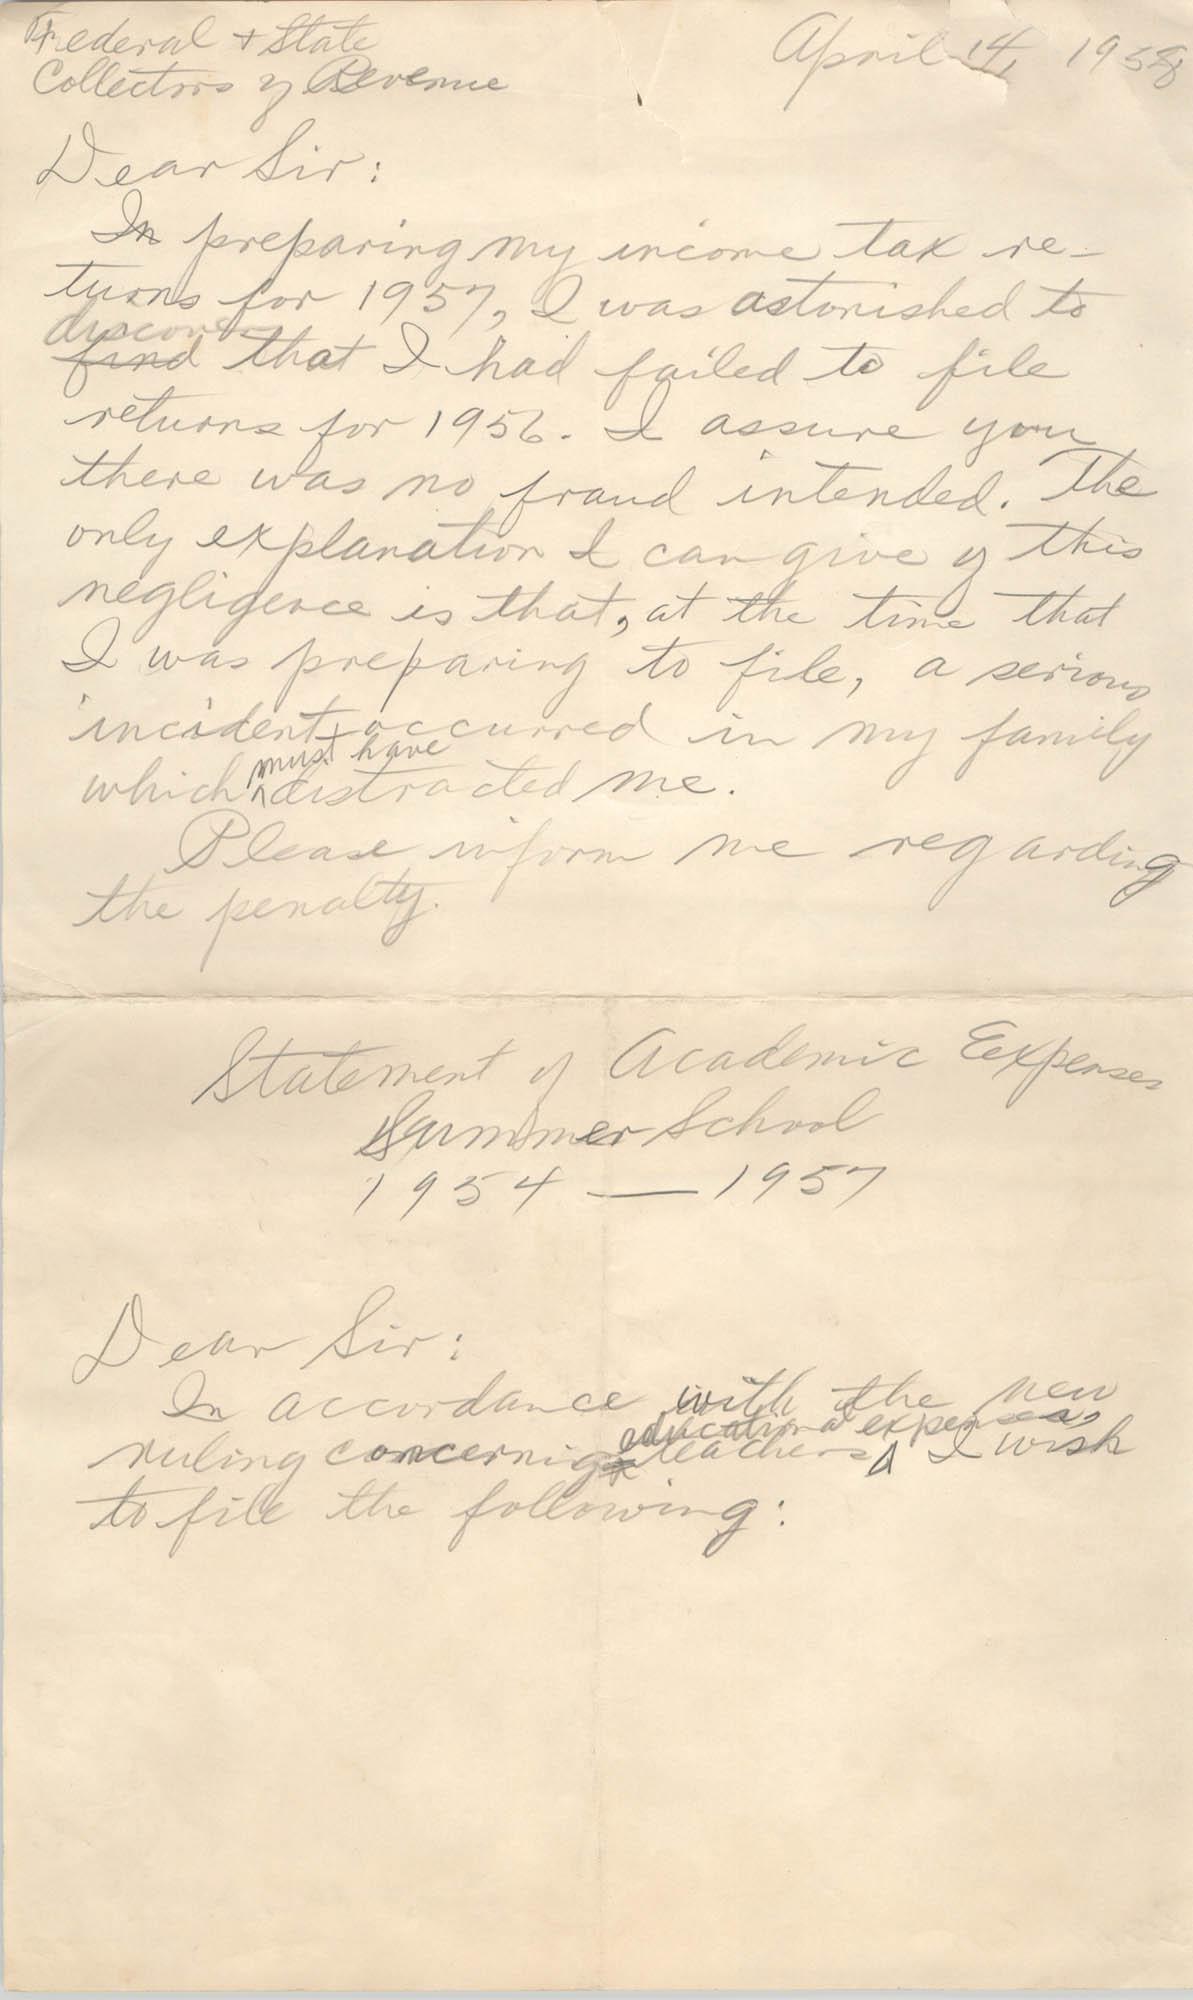 Letter from Eugene C. Hunt, April 14, 1958